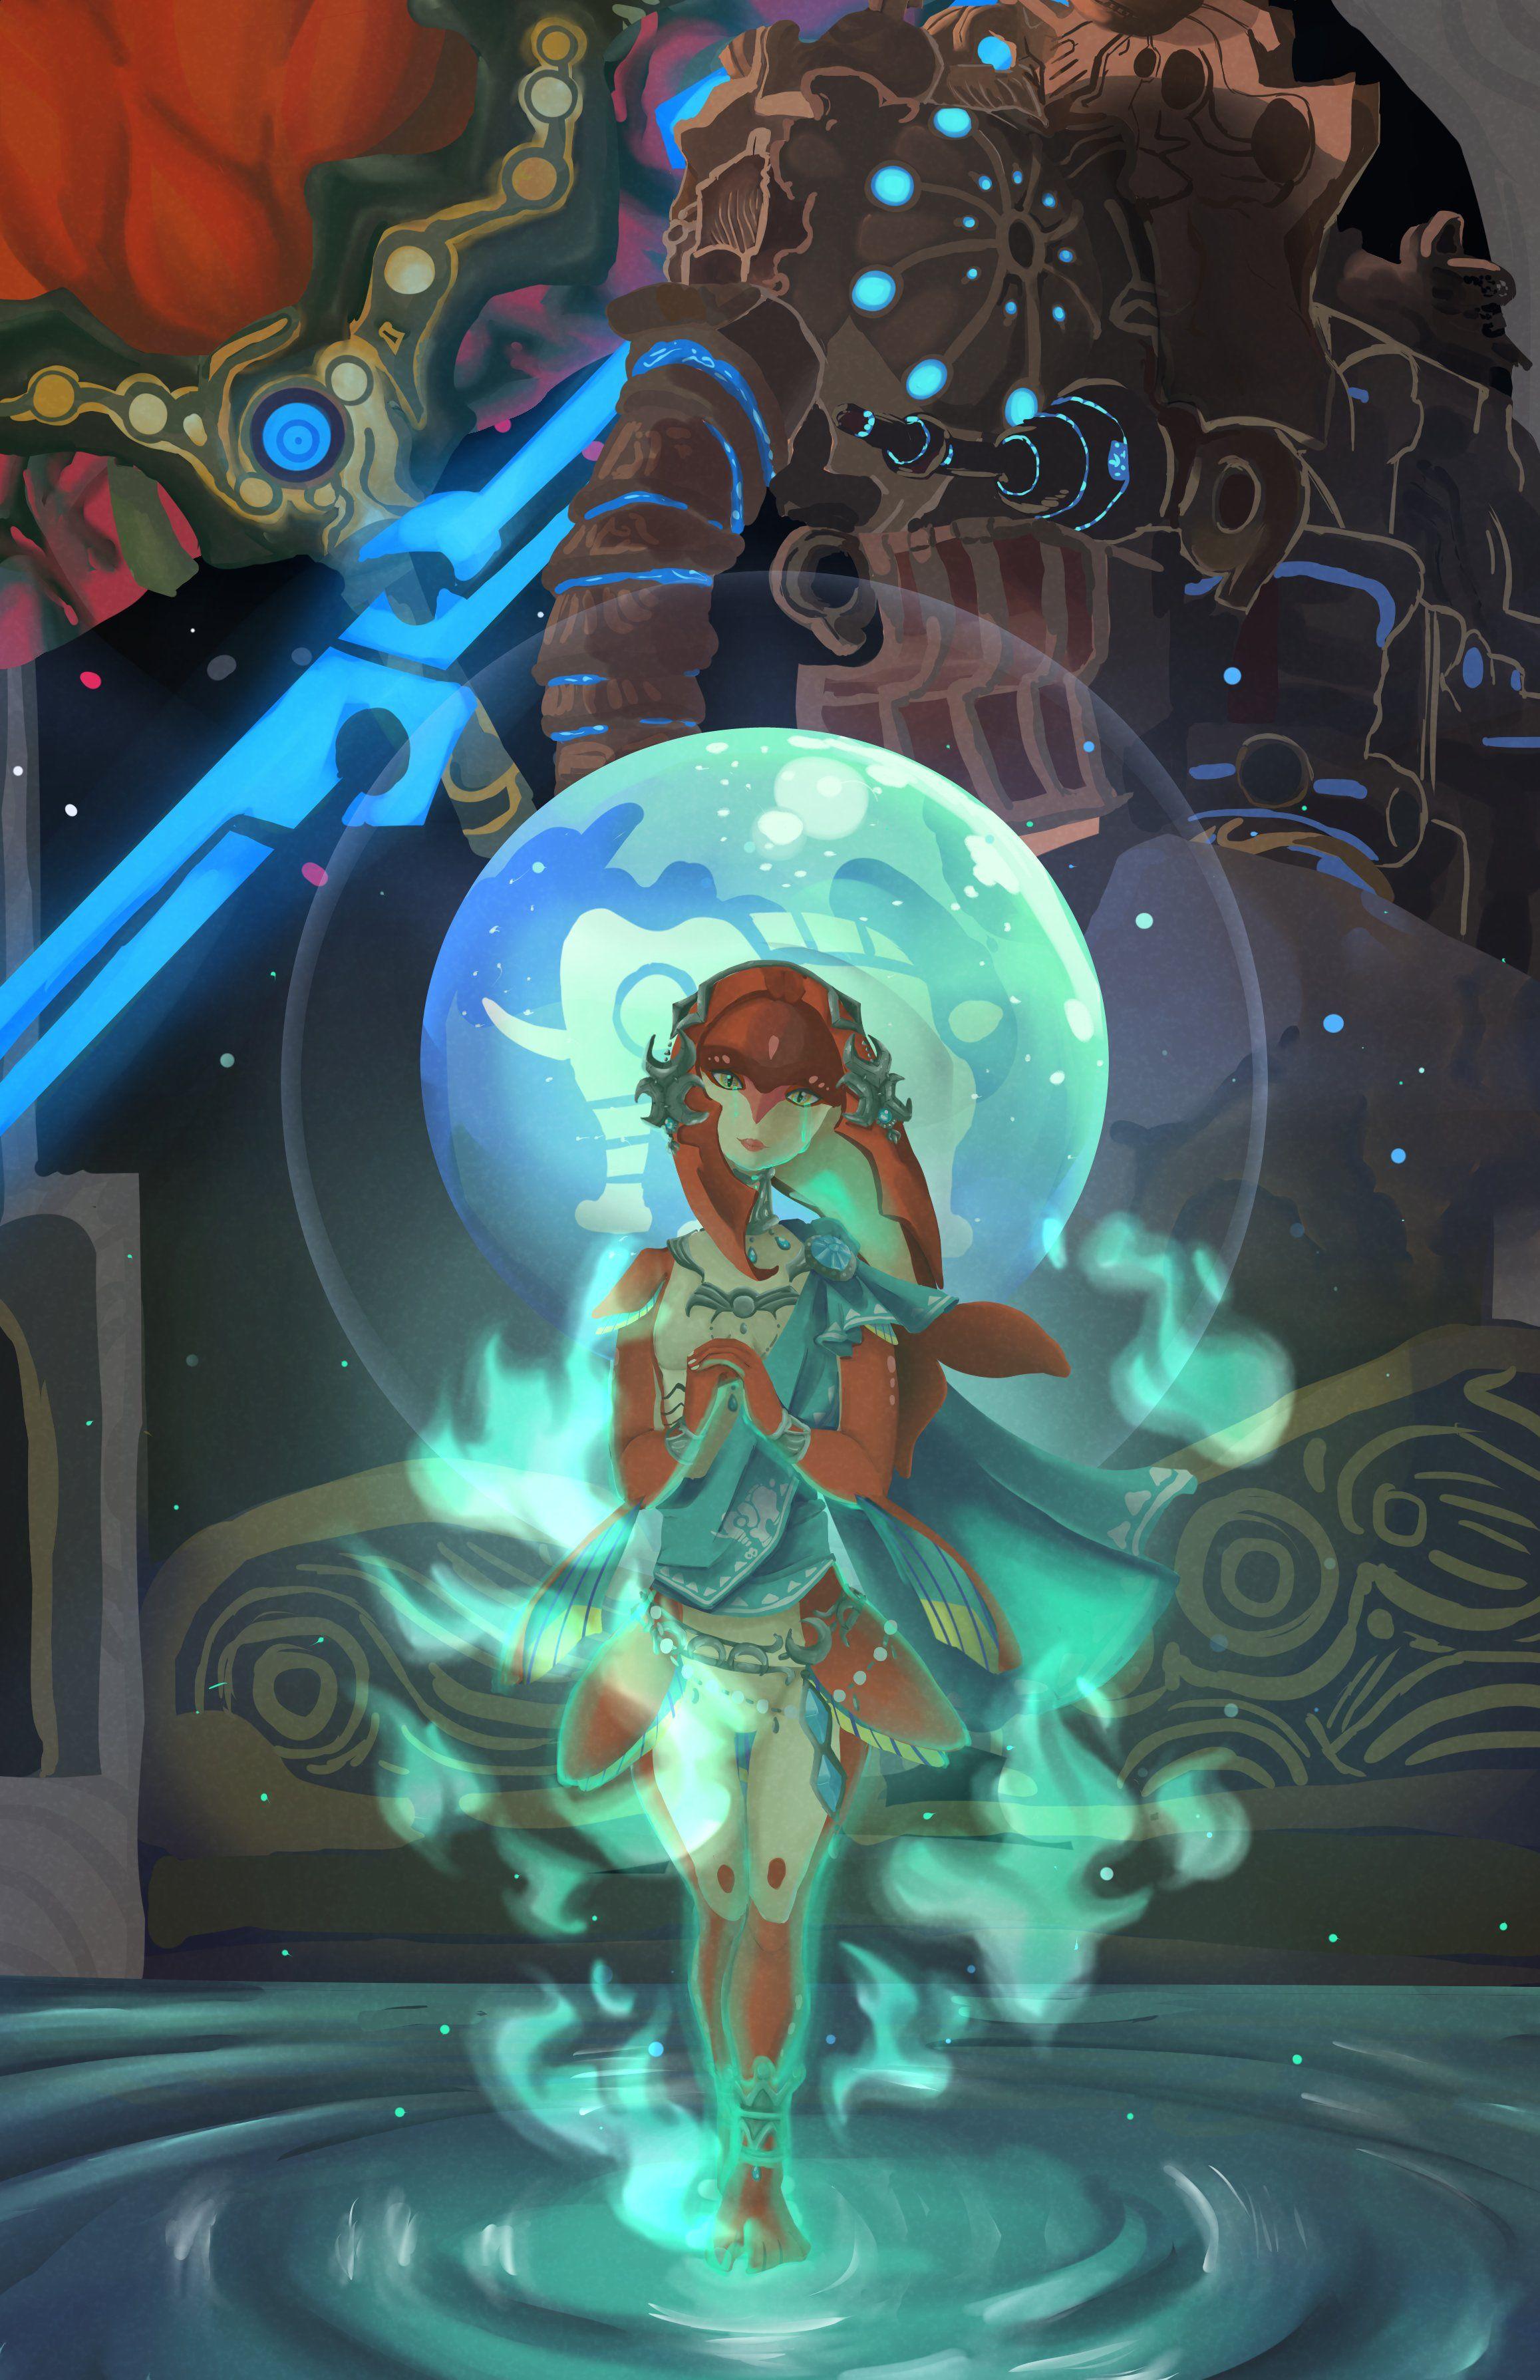 Stitchesofsouls On Twitter Legend Of Zelda Breath Legend Of Zelda Memes Legend Of Zelda